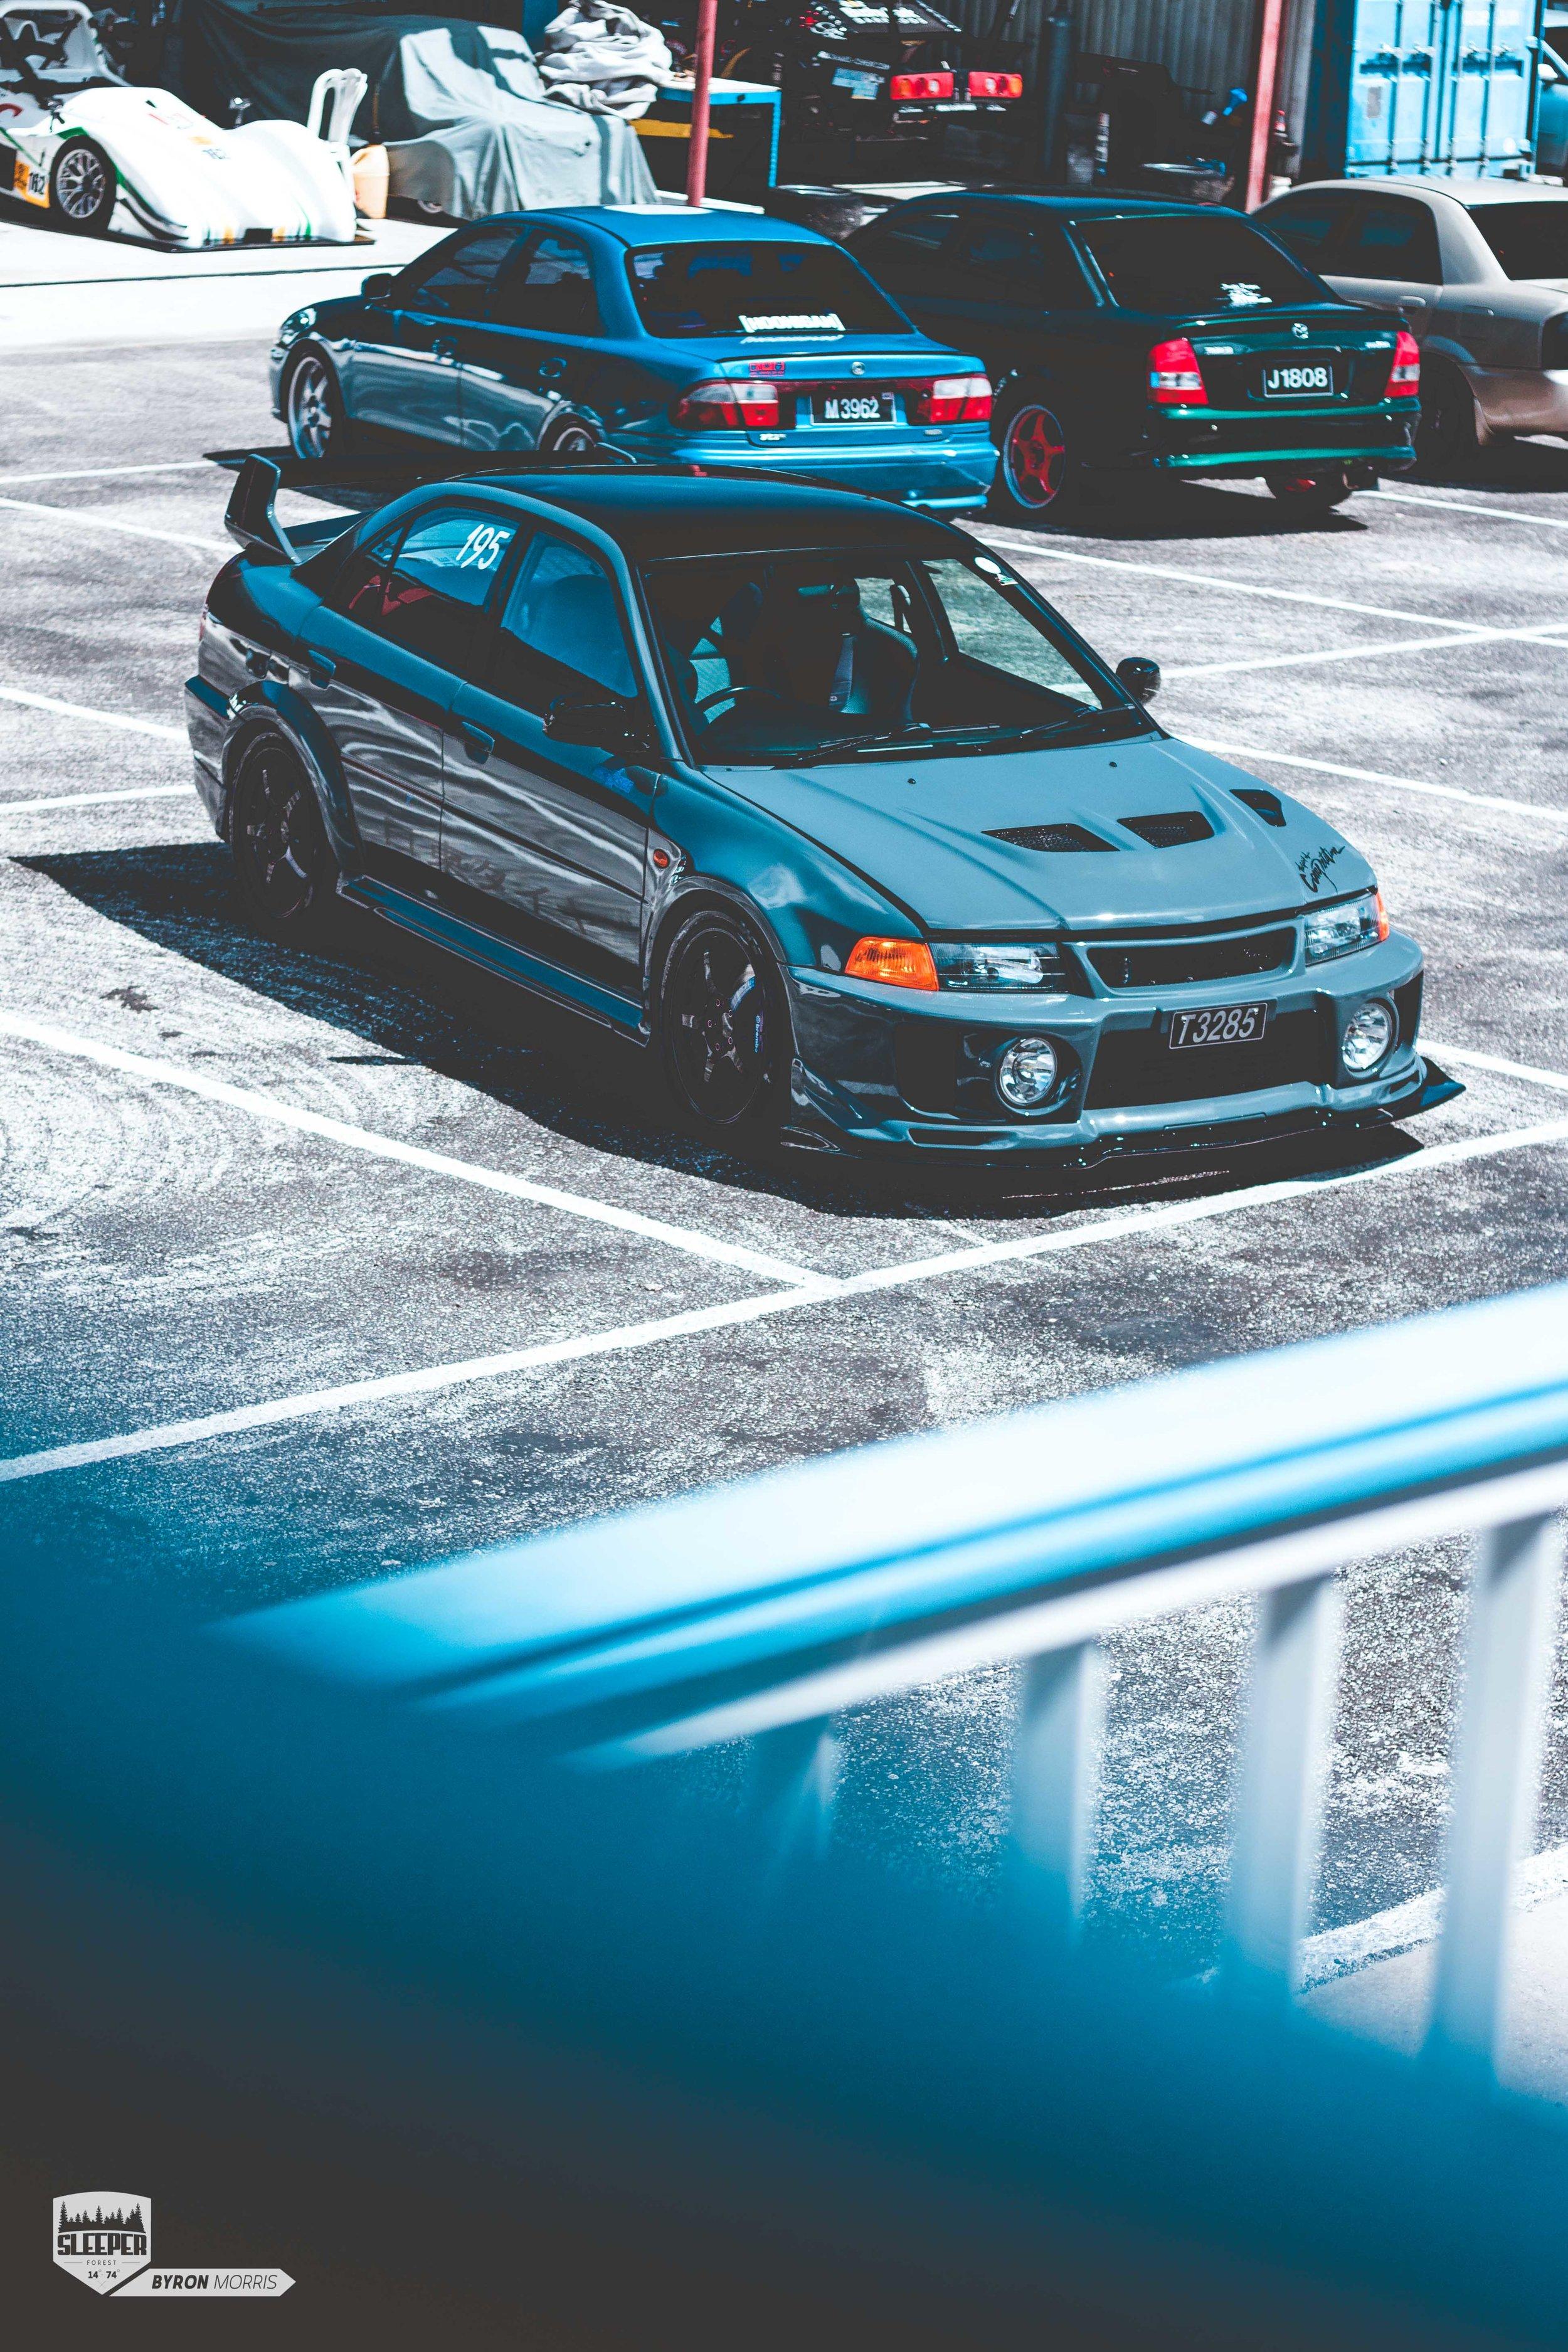 Rep_ya_ride_2019_barbados_car_culture-6.jpg